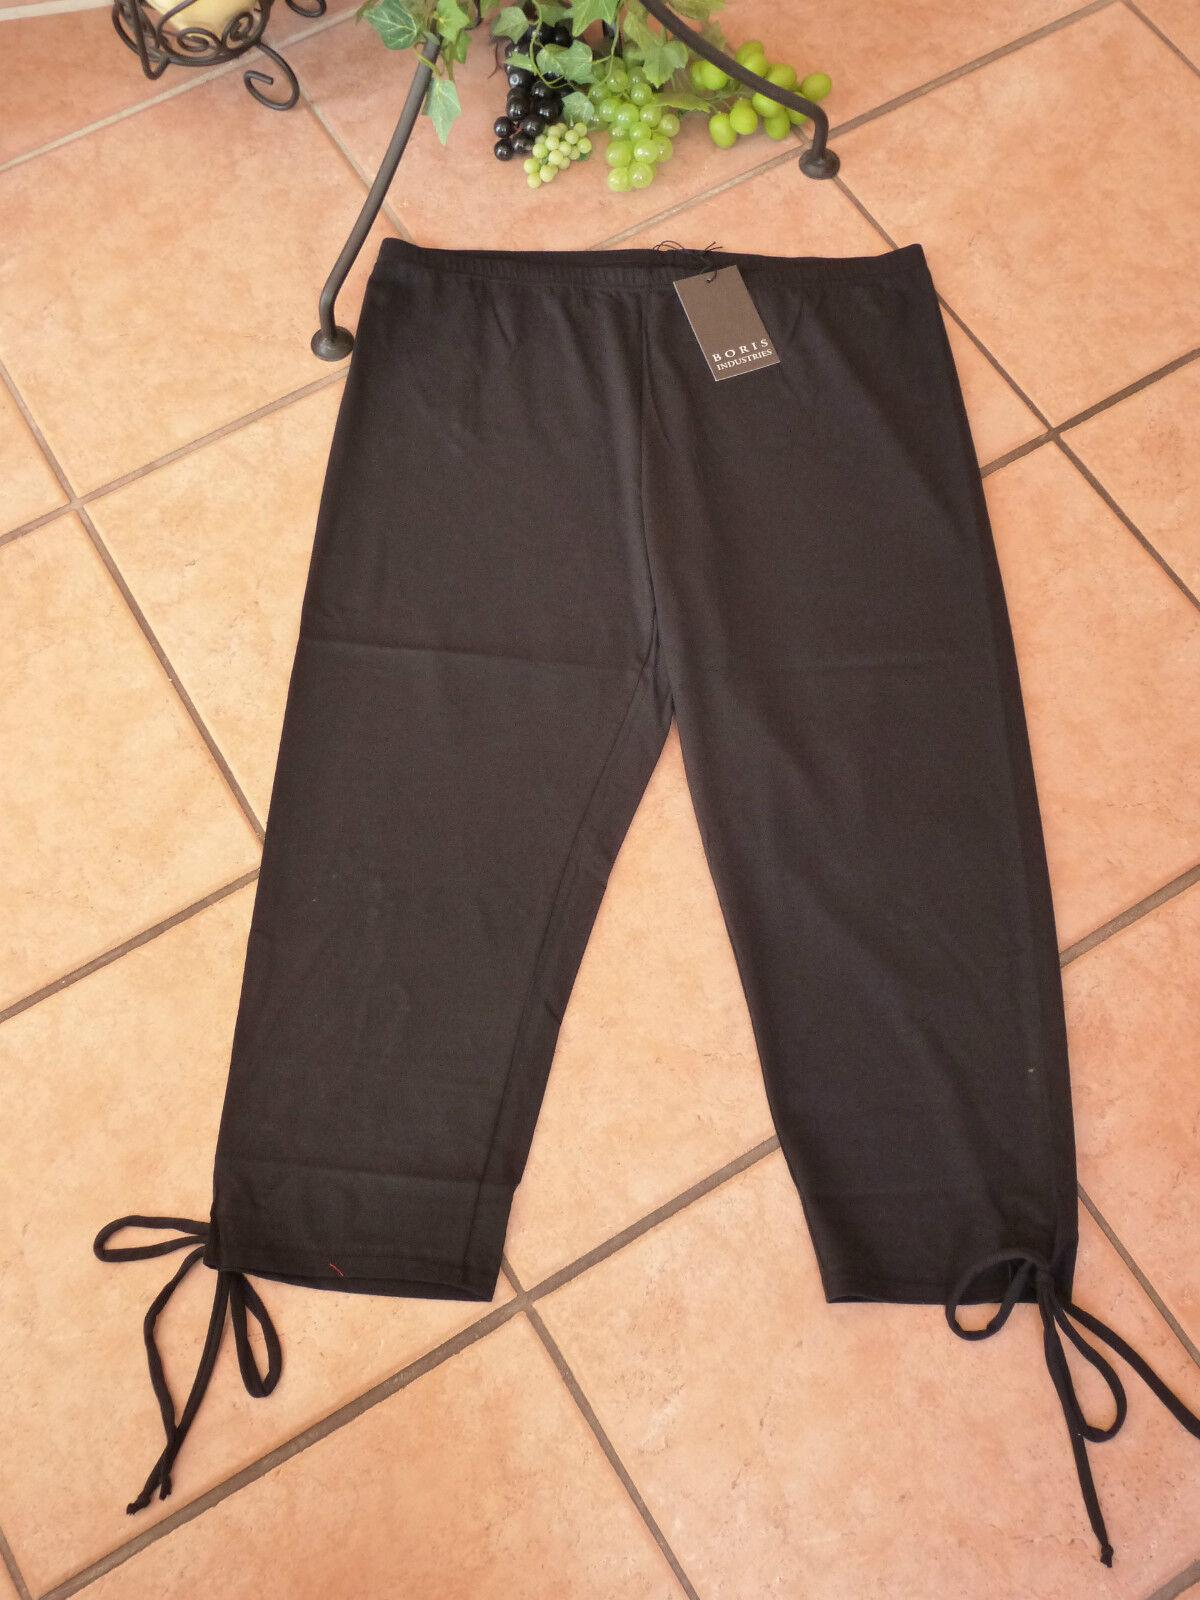 BORIS INDUSTRIES 7 8 Leggings 44 46 (3) NEU black Bänder LAGENLOOK Stretch